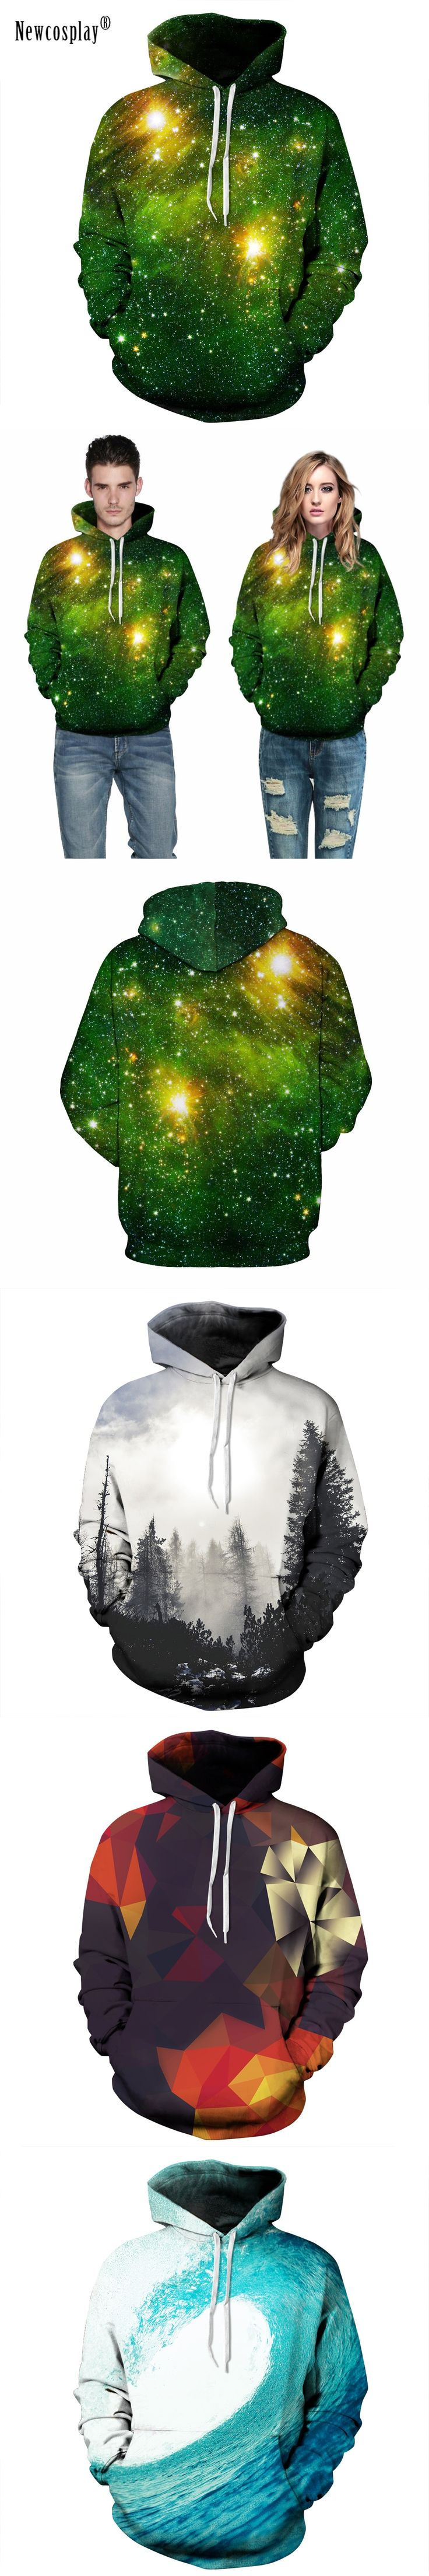 BTS Linkin Park Men's Sweatshirts Print Shrink Stars Women Hoodies With Hat New Autumn Winter Loose Hooded Men's Sportswear Tops